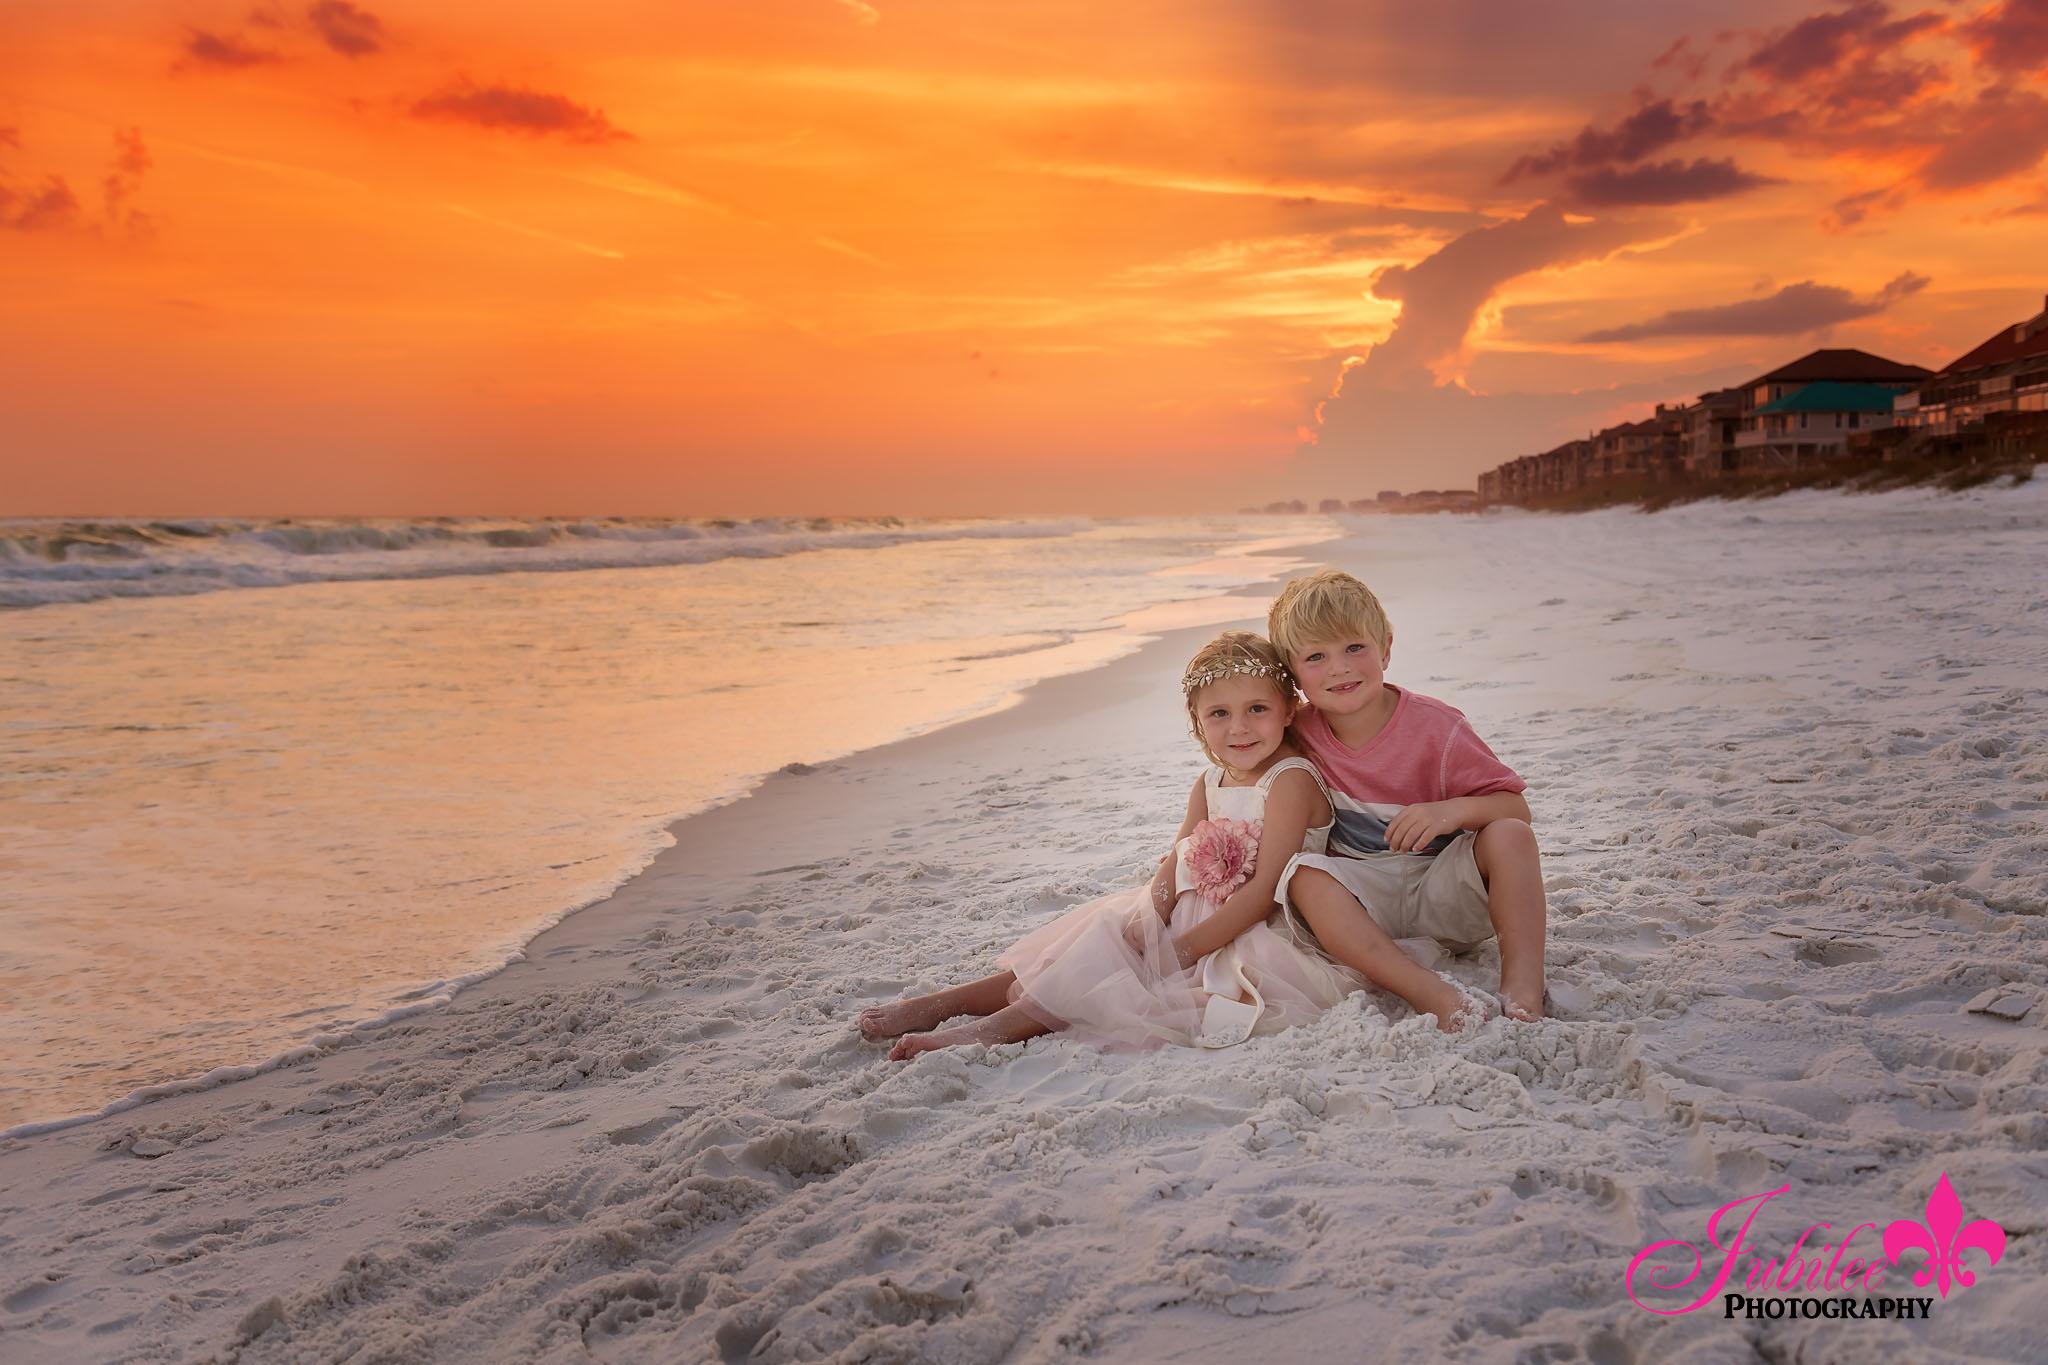 destin_beach_photographer_6207